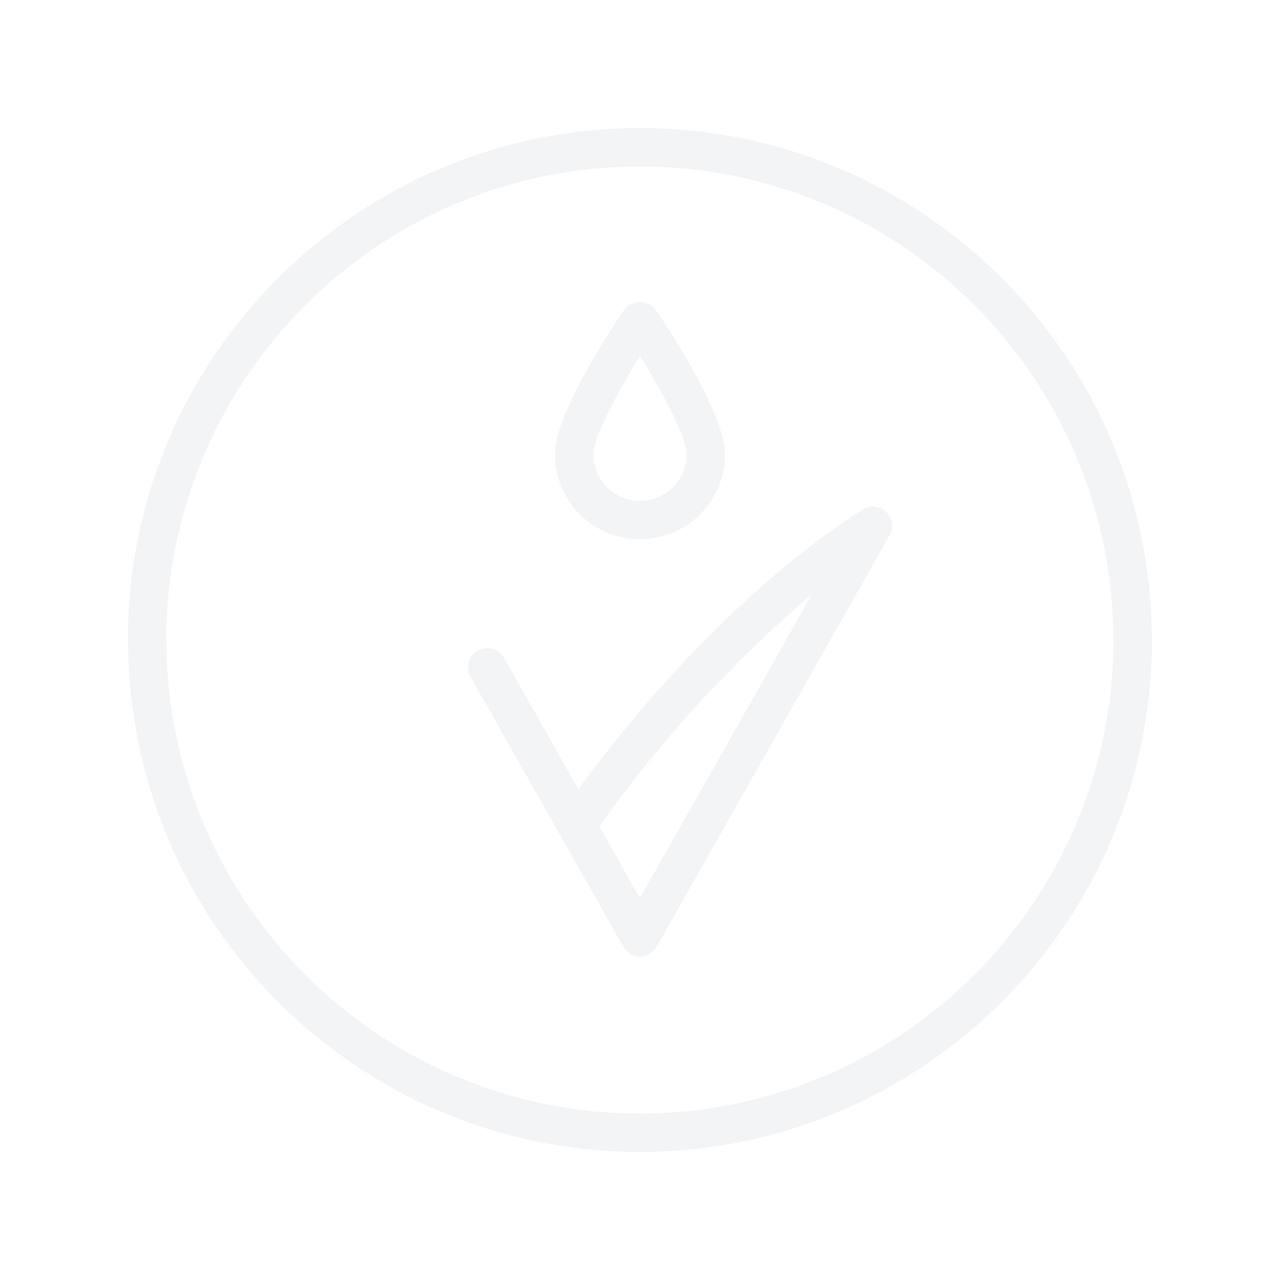 BIOKAP Nutricolor 7.1 Swedish Blond Permanent Hair Dye 140ml